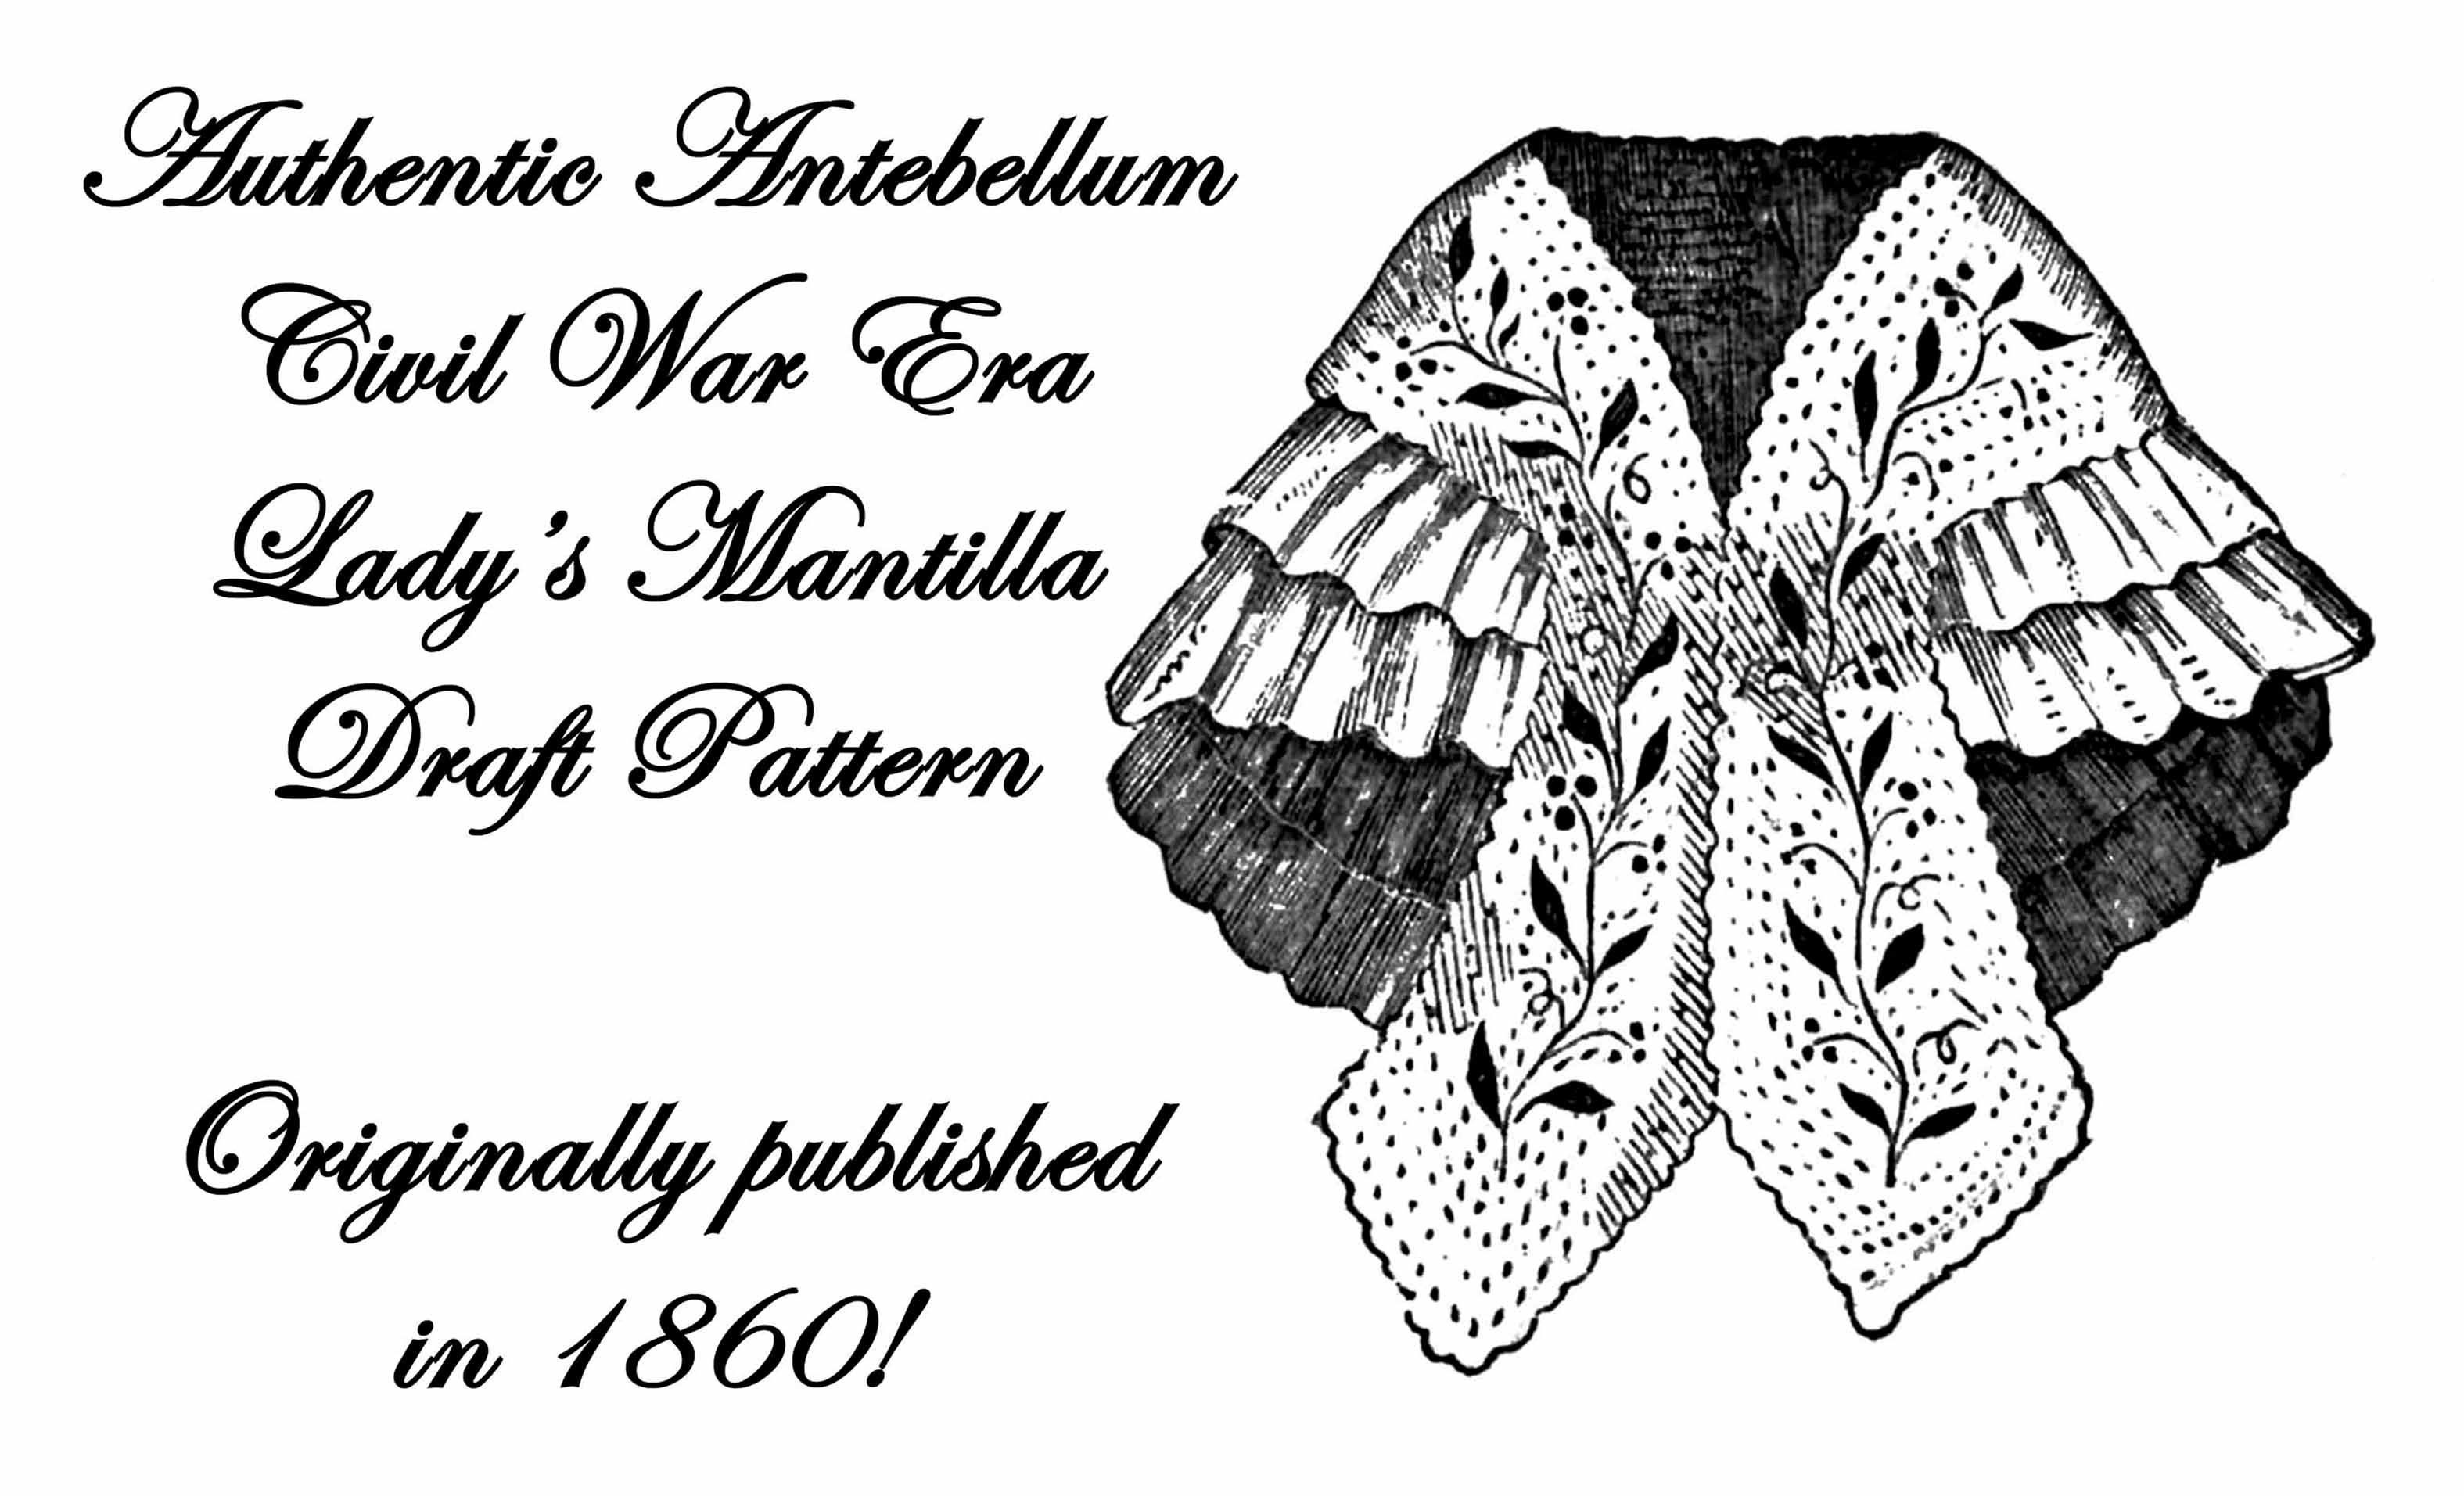 Cape Pattern Knitting Antebellum Victorian Civil 1859